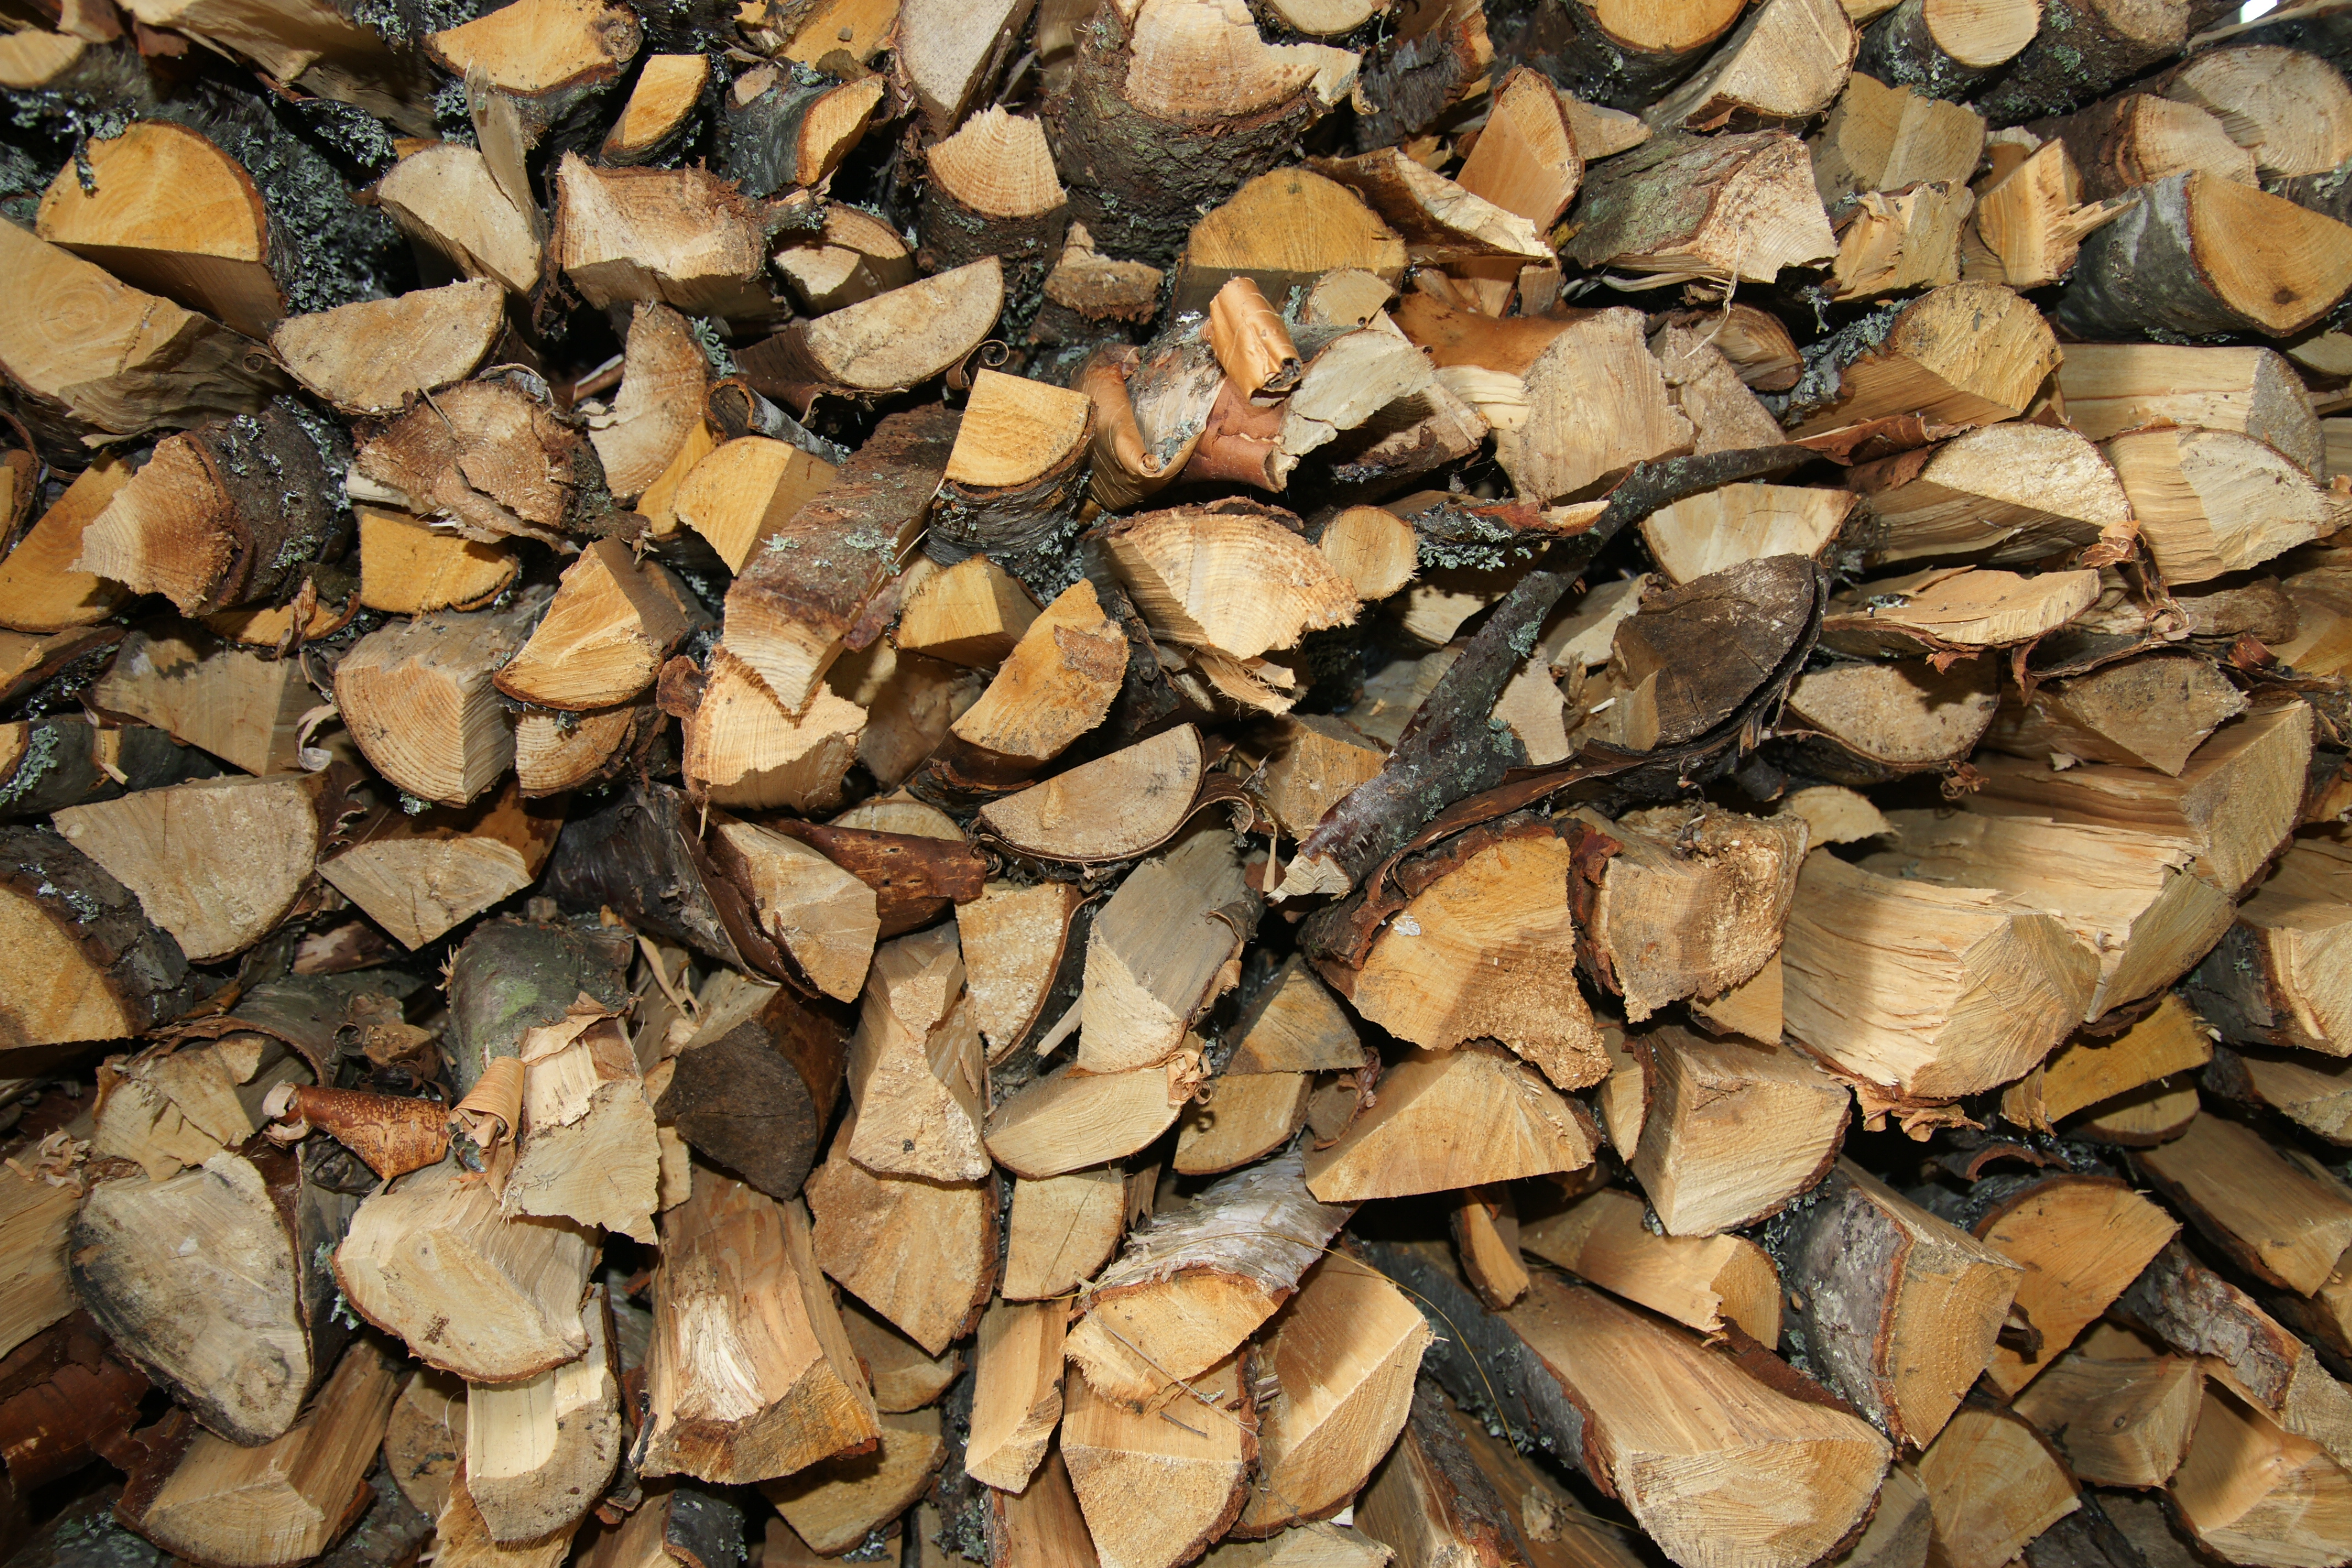 File:Woodpile.JPG - Wikimedia Commons